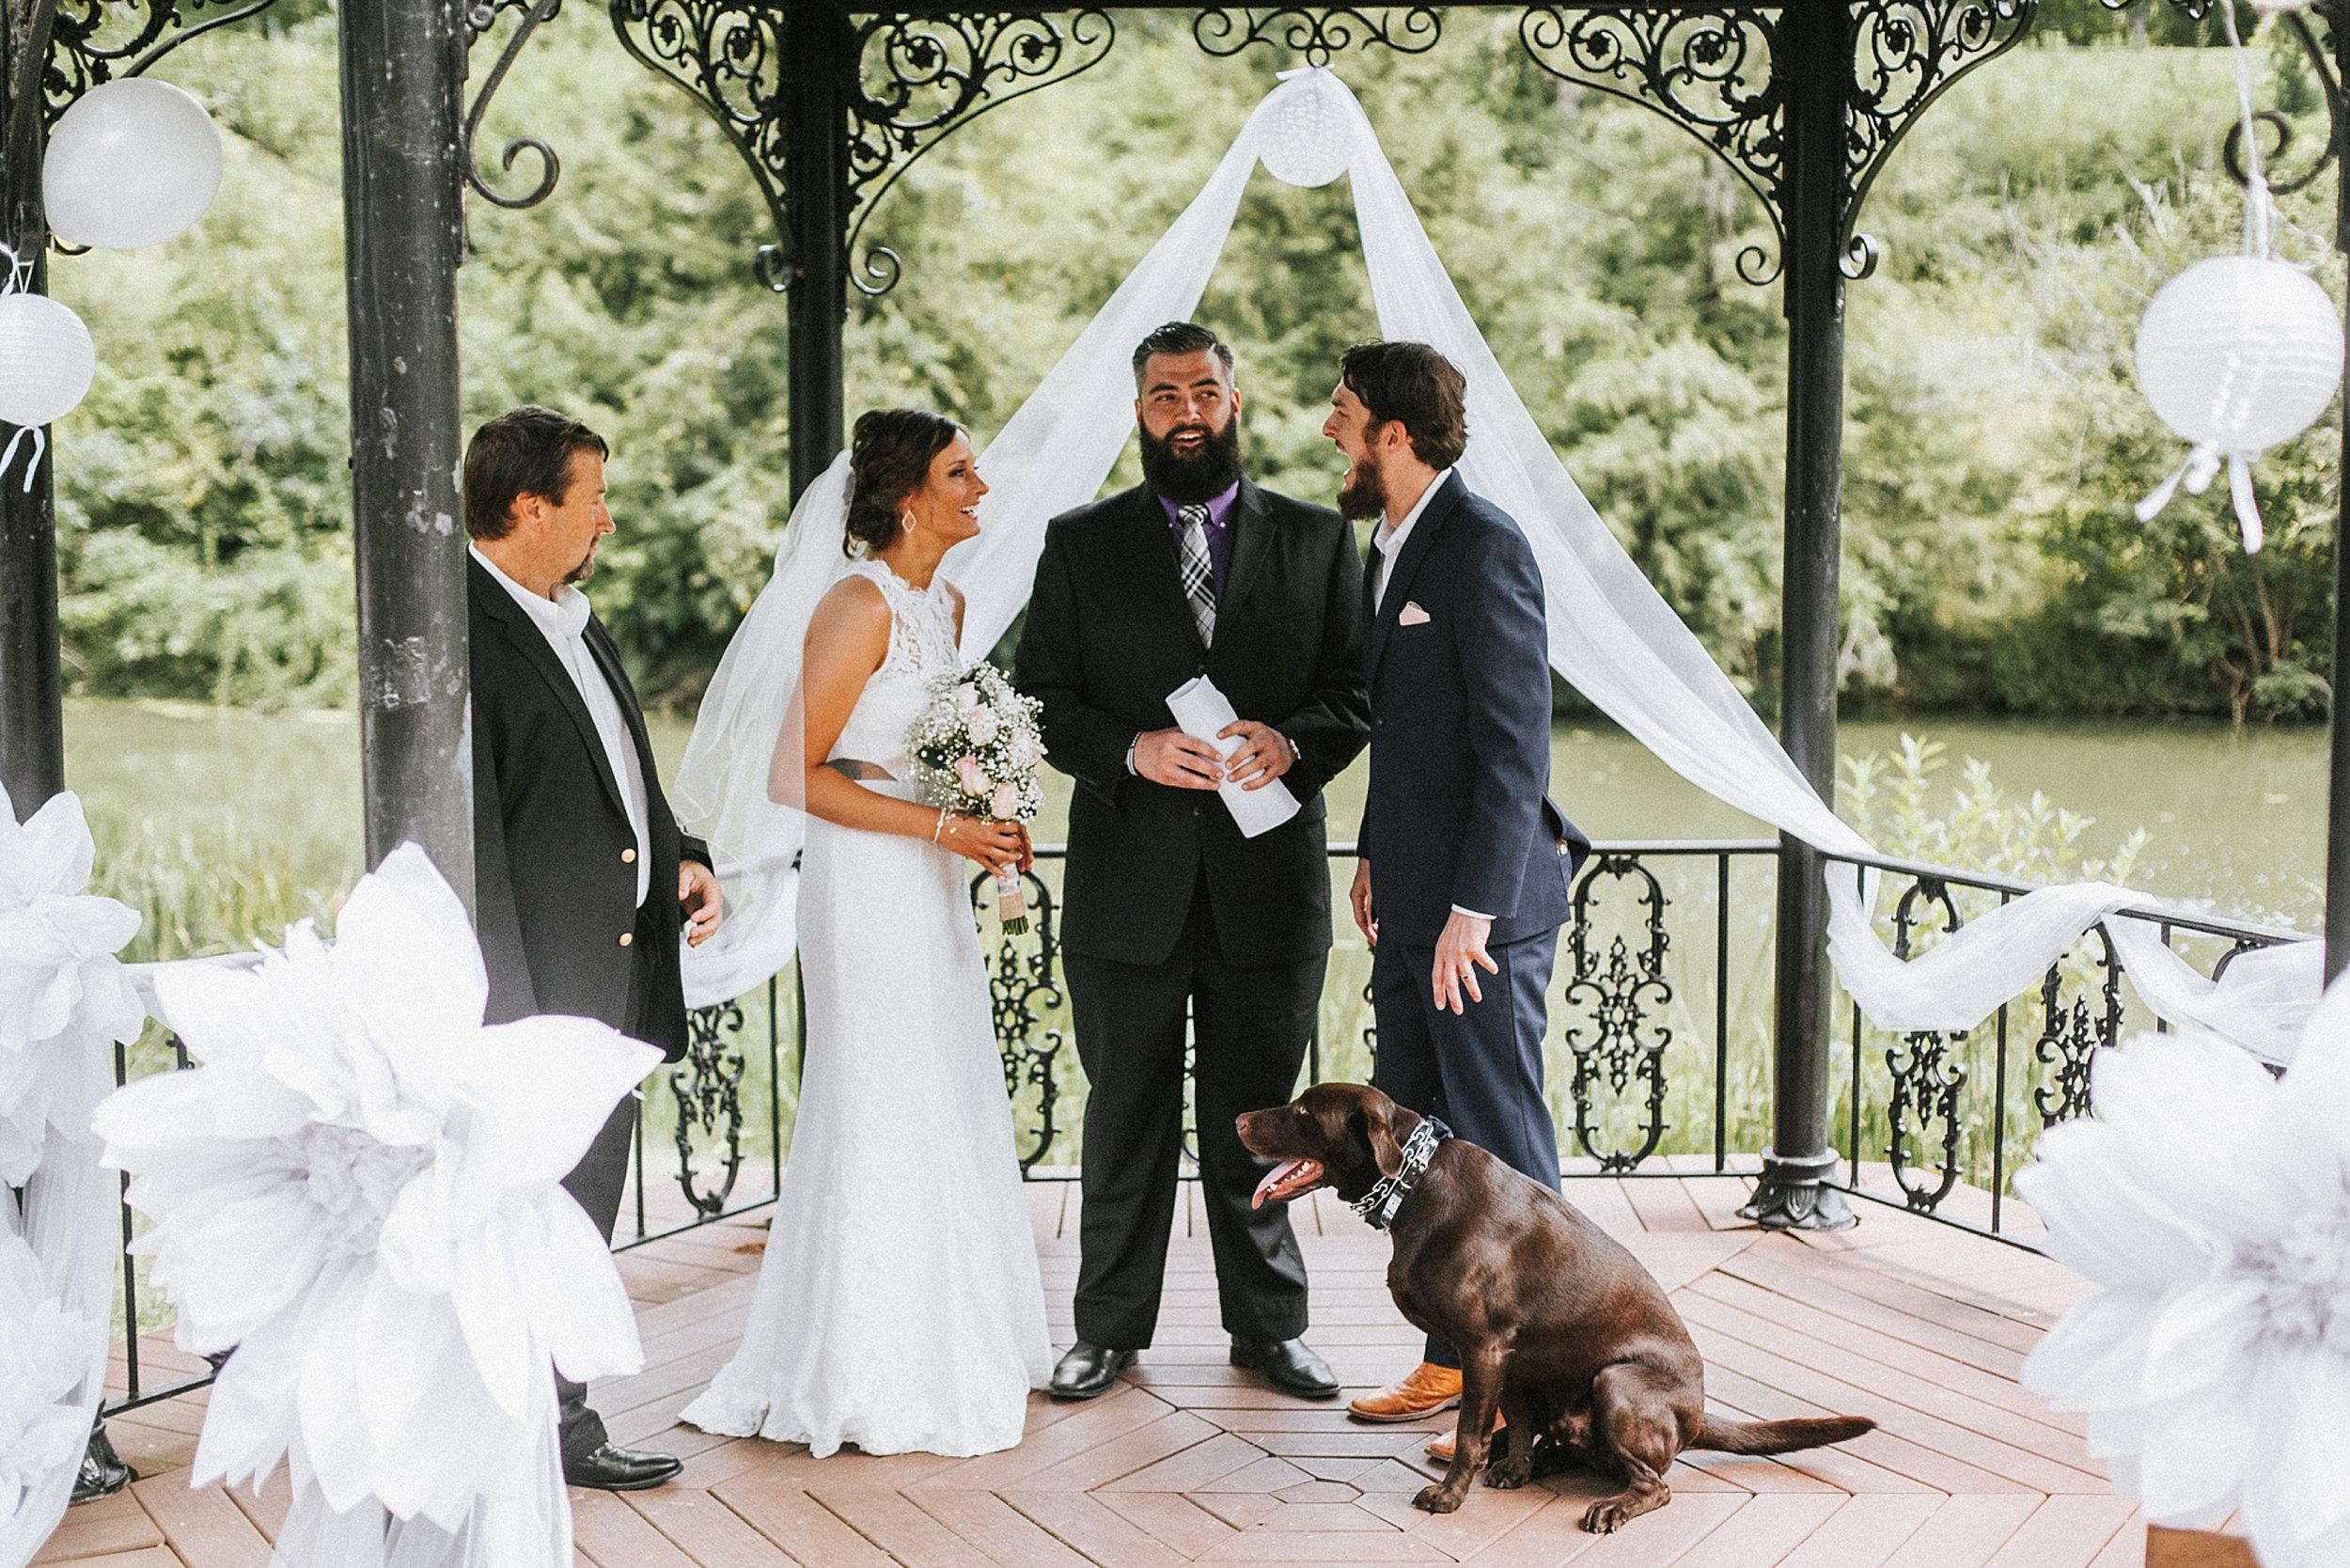 Brooke Townsend Photography - Ohio Wedding Photographer (55 of 78).jpg